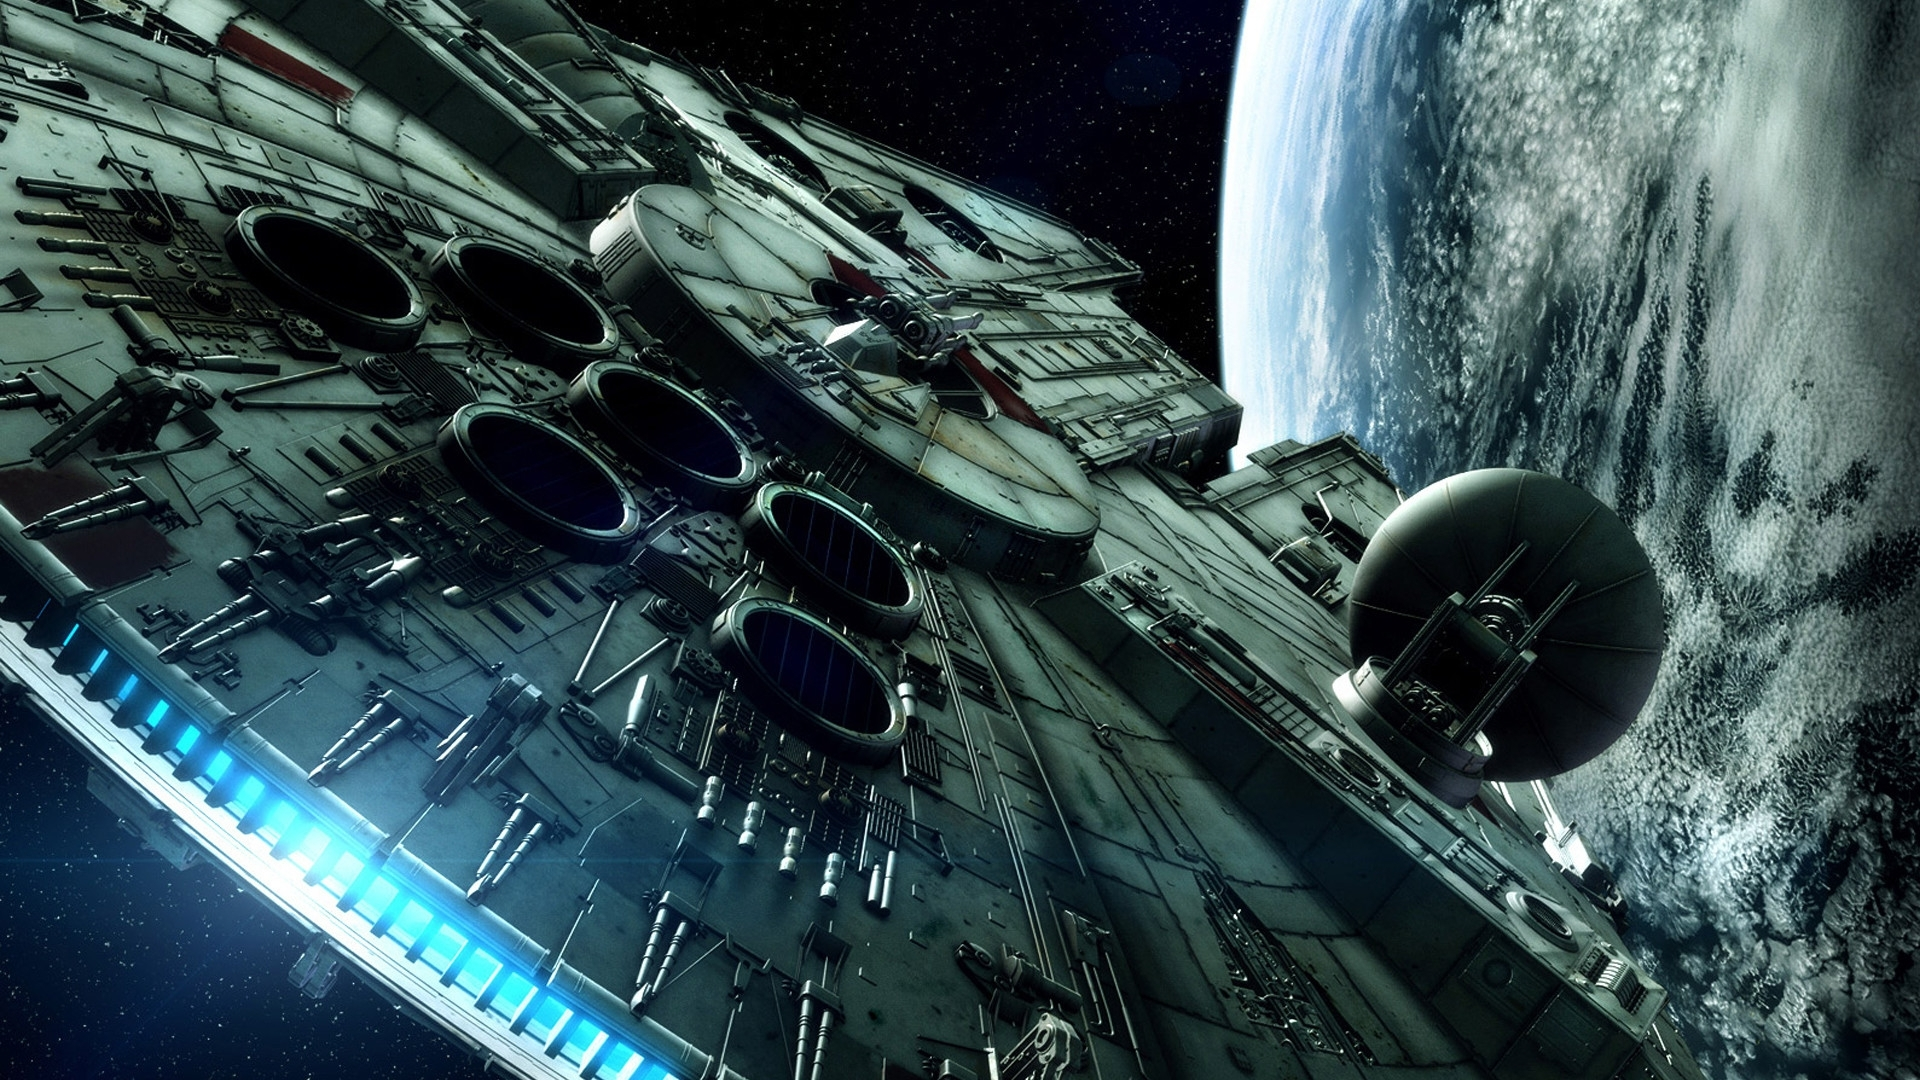 Title Star Wars Wallpaper 1080p 73 Images Dimension 1920 X 1080 File Type JPG JPEG